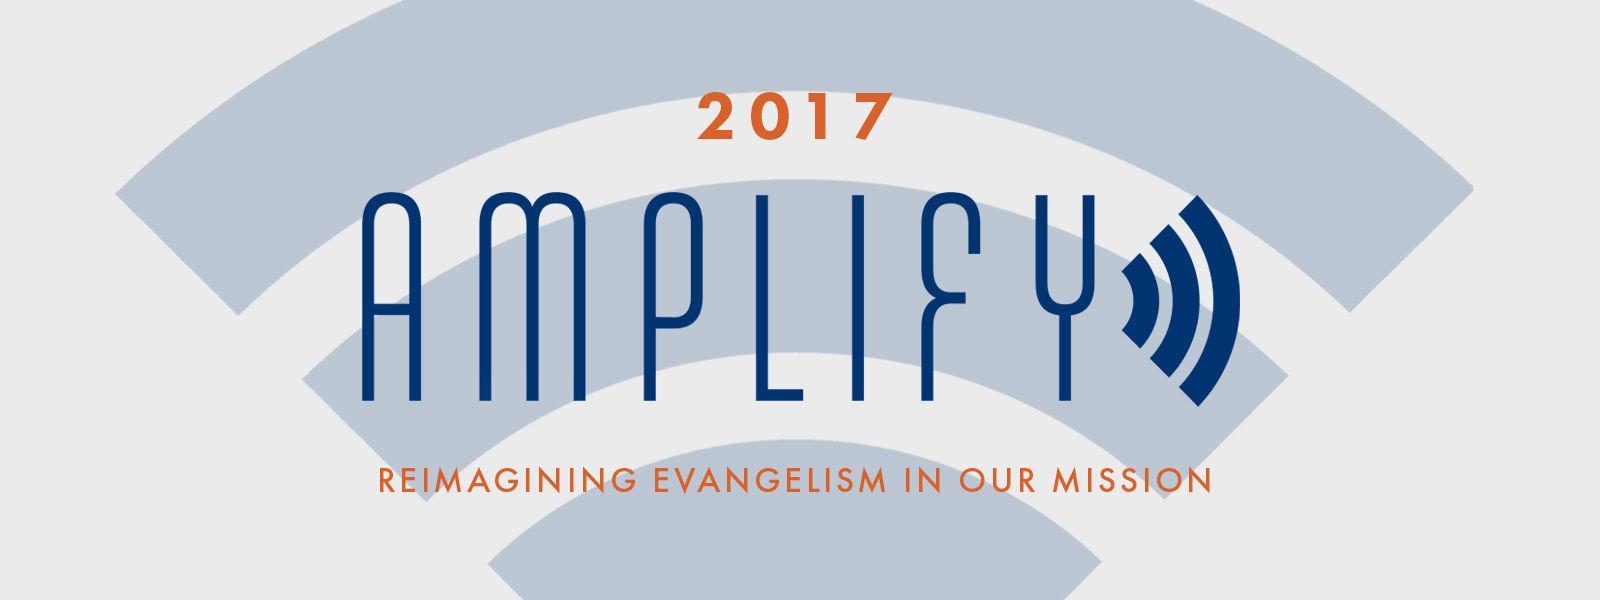 Amplify 2017: Reimagining Evangelism in Our Mission